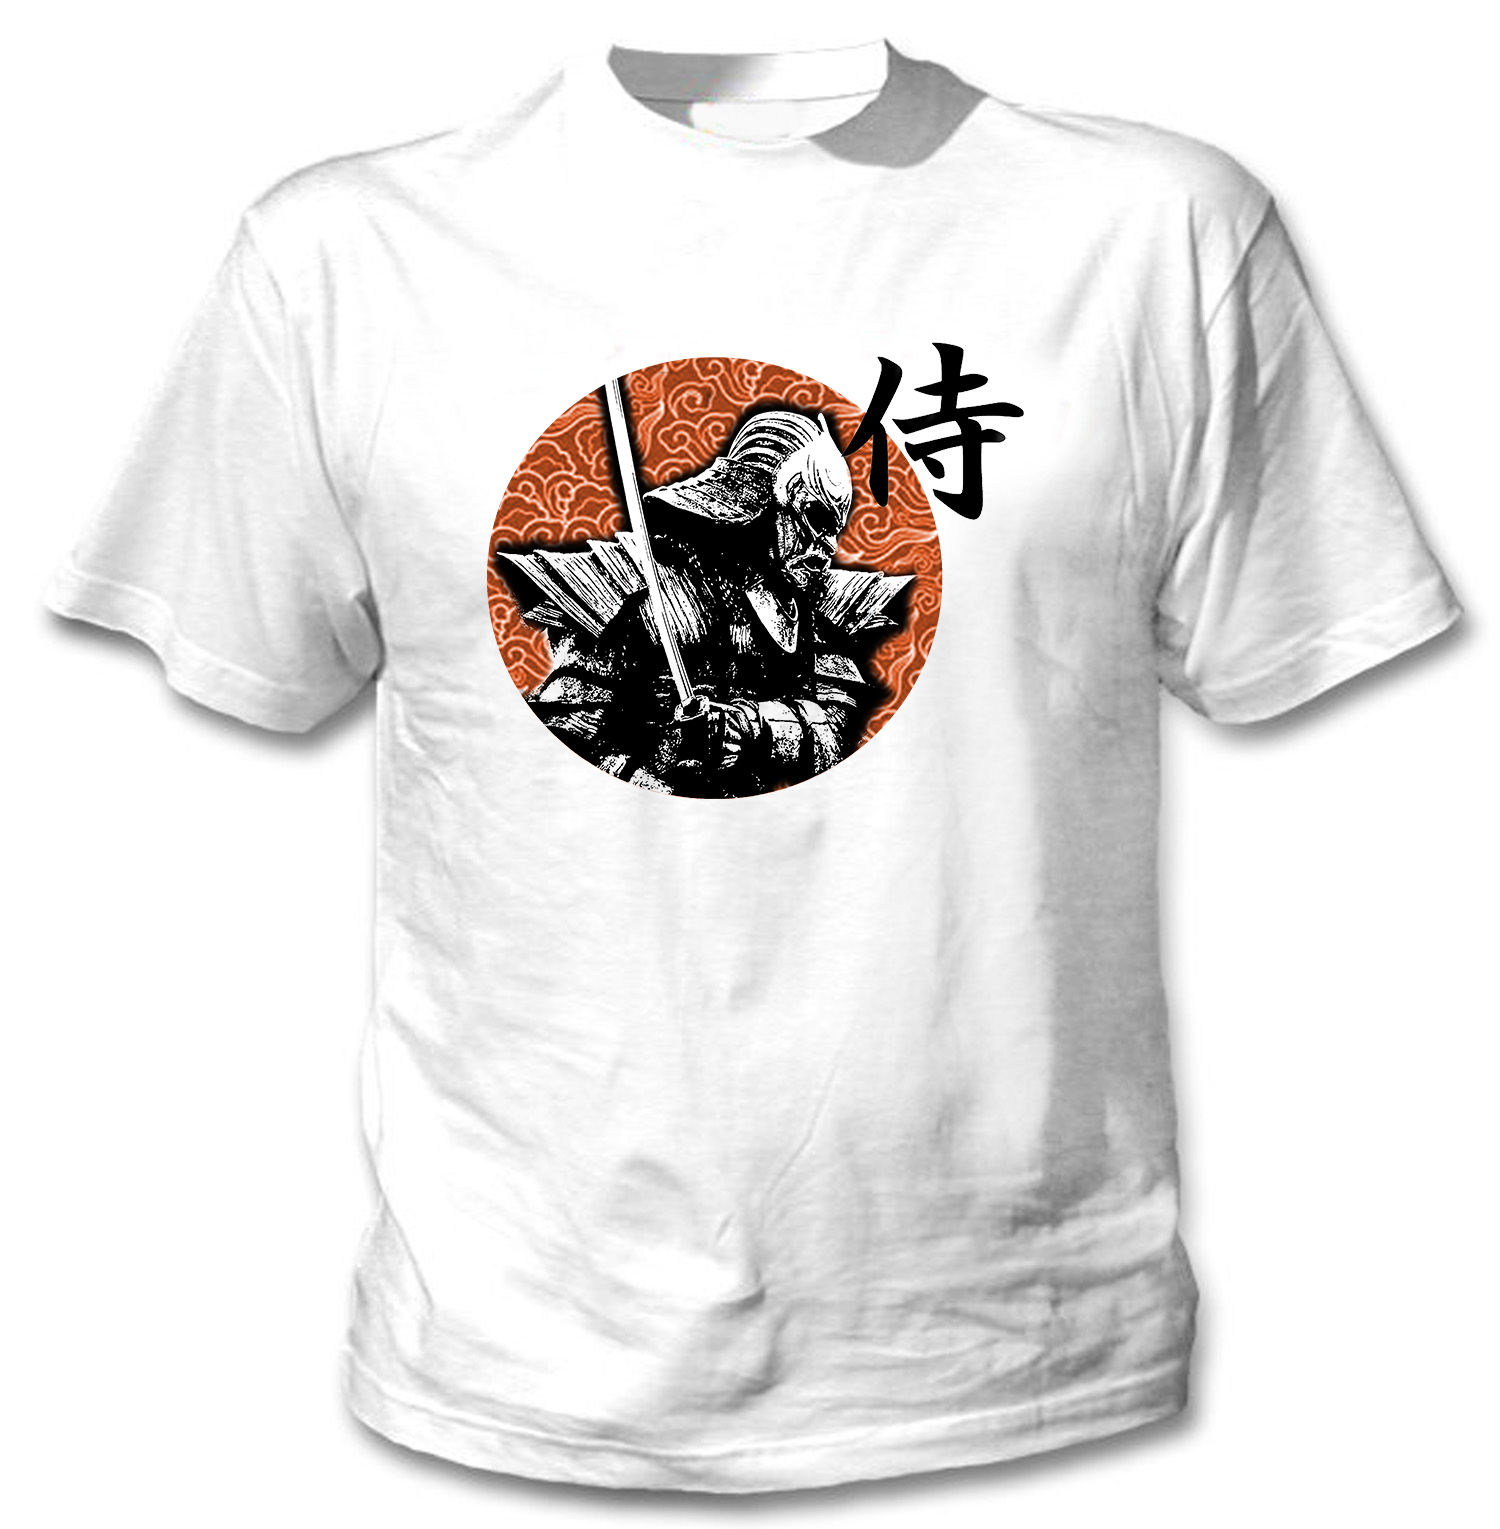 2018 New Fashion Funny T-shirt SAMURAI JAPAN WARRIOR 1 - NEW COTTON WHITE TSHIRT